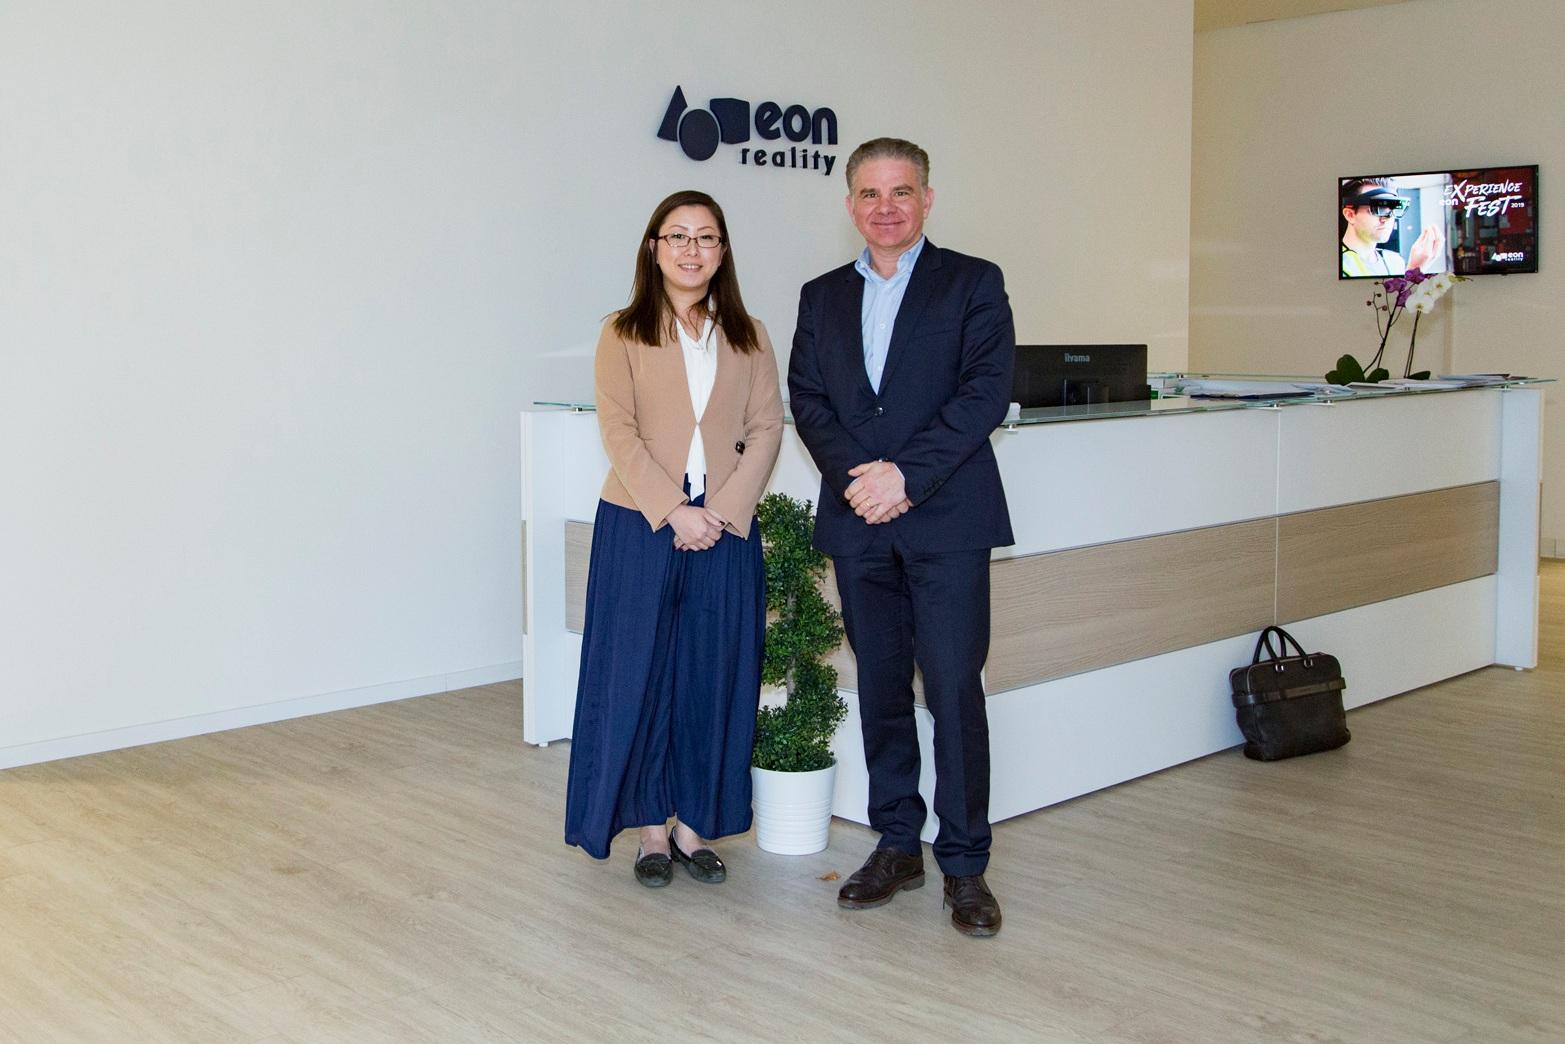 EON Realityの創始者Dan LejerskarさんとAVRJapanの立石万弓さん。EON Reality founder Dan Lejerskar and AVRJapan's Mayumi Tateishi.